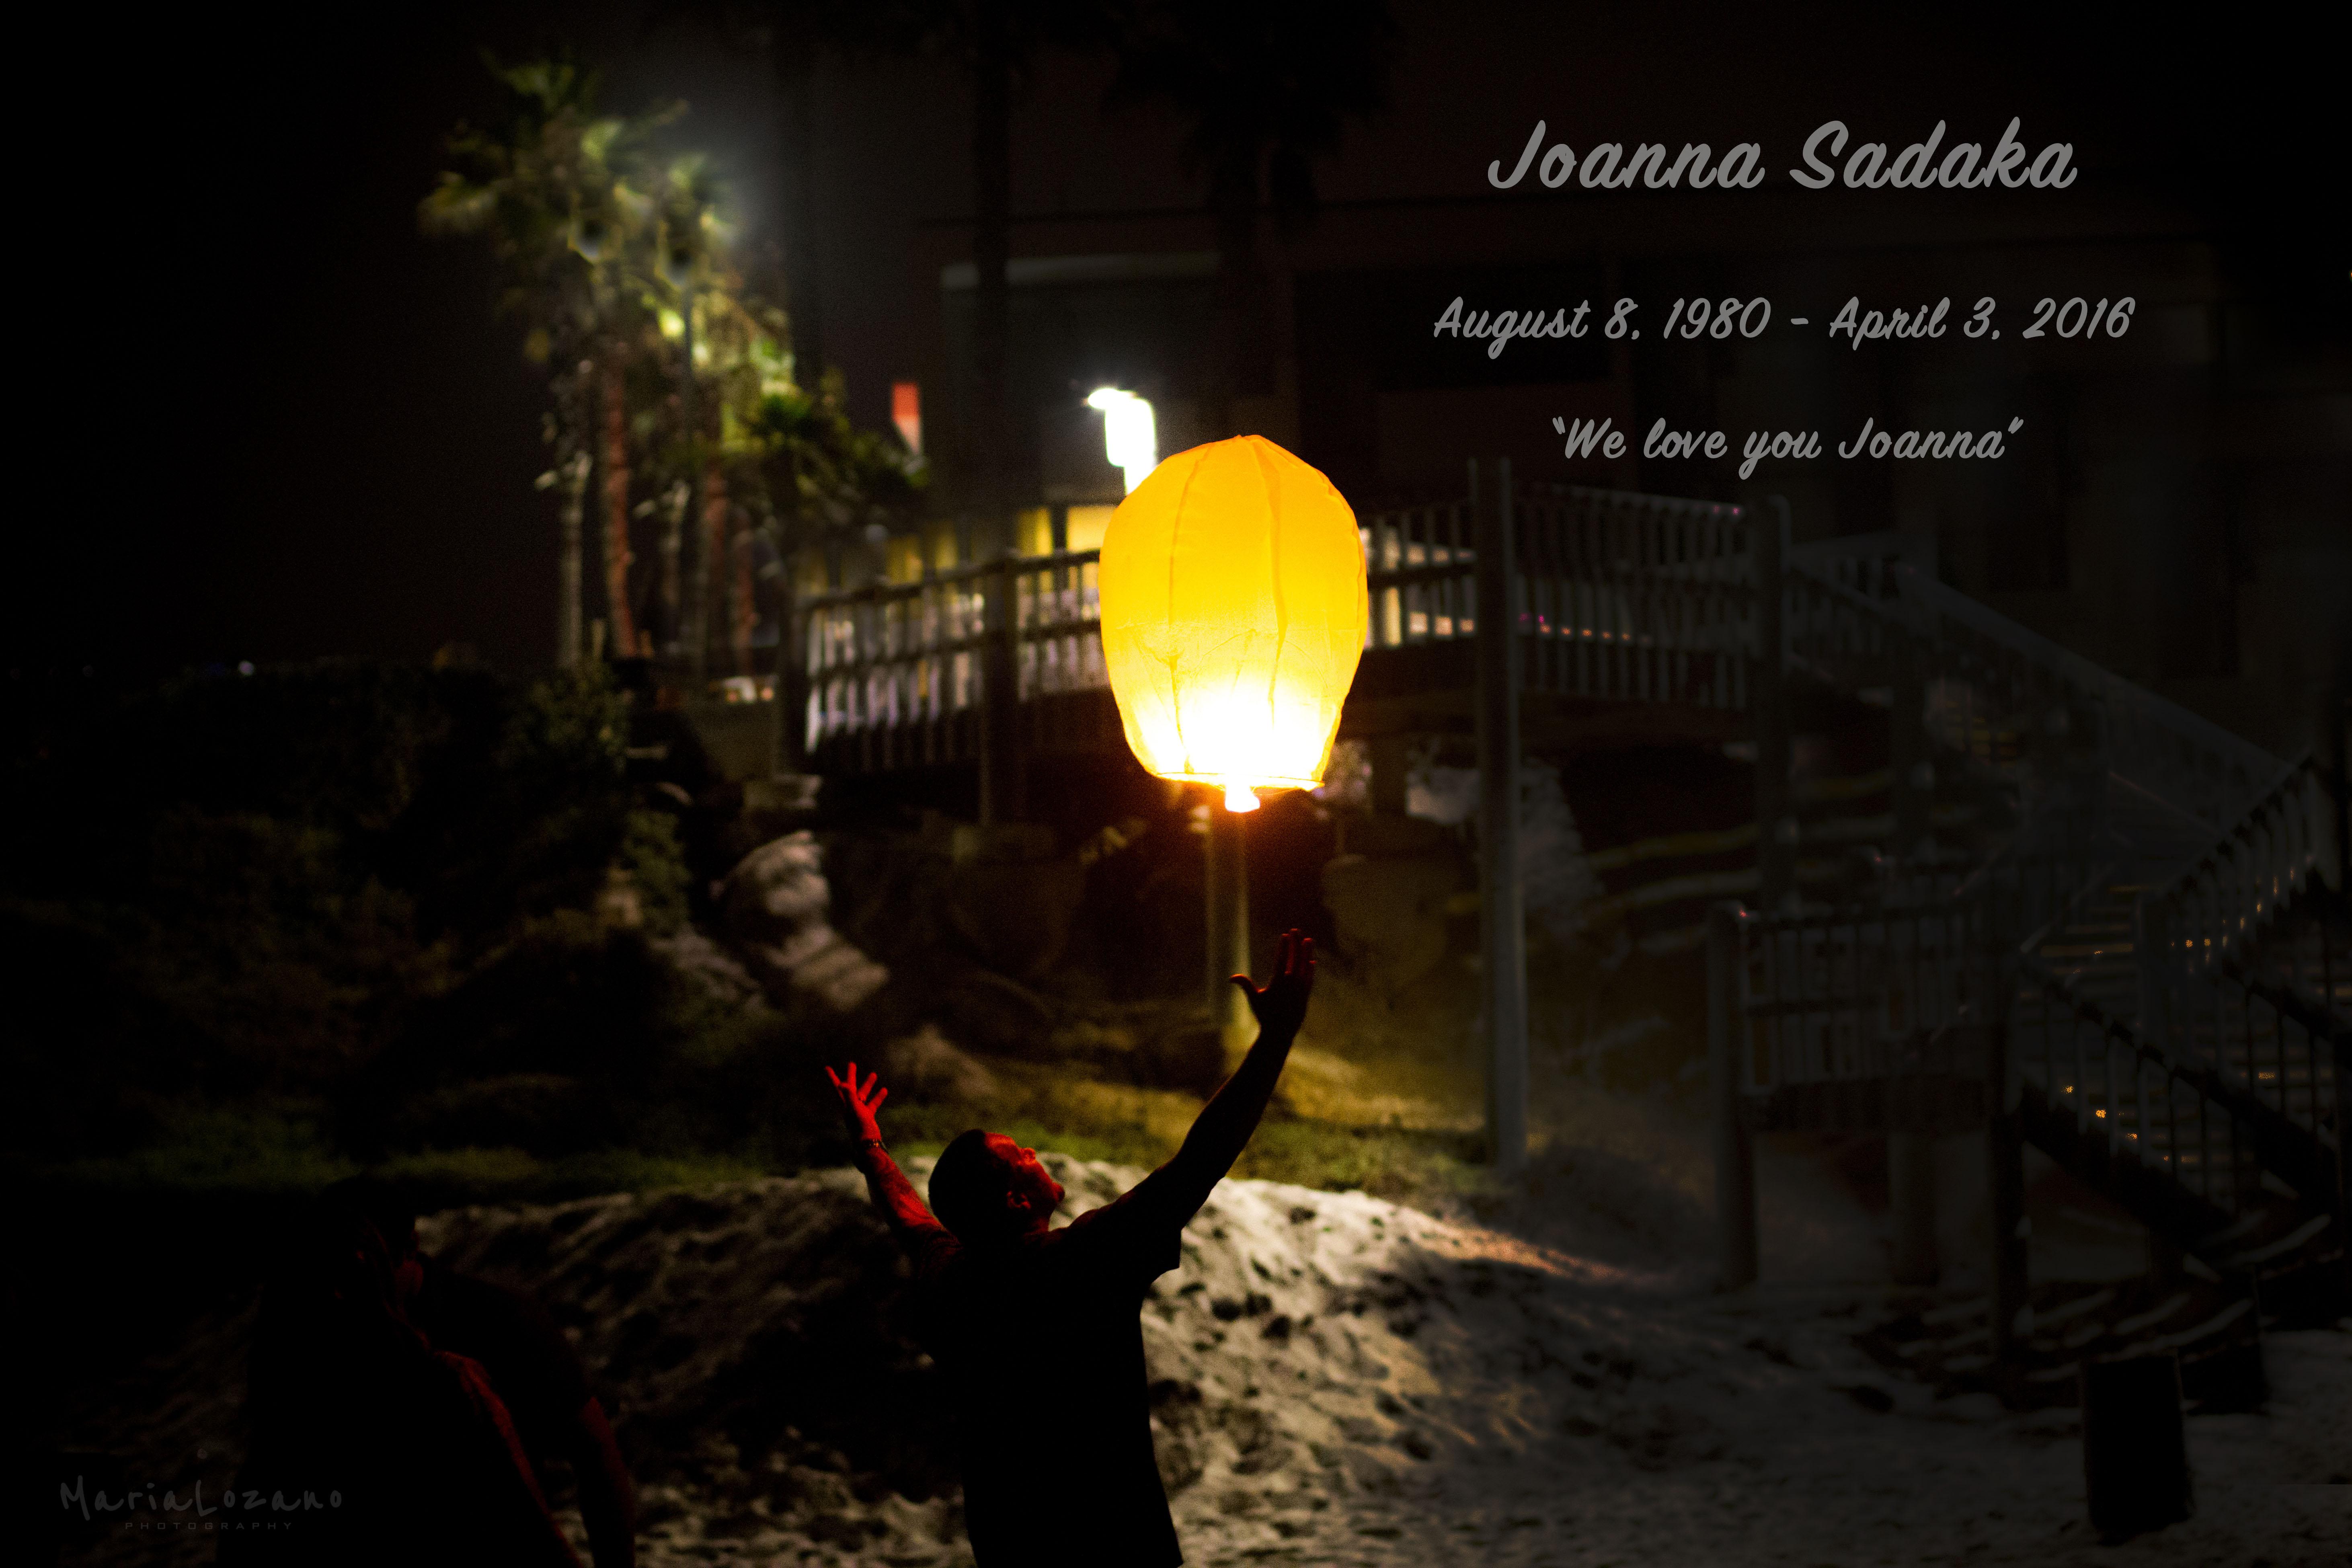 Joanna-4040(announcement)